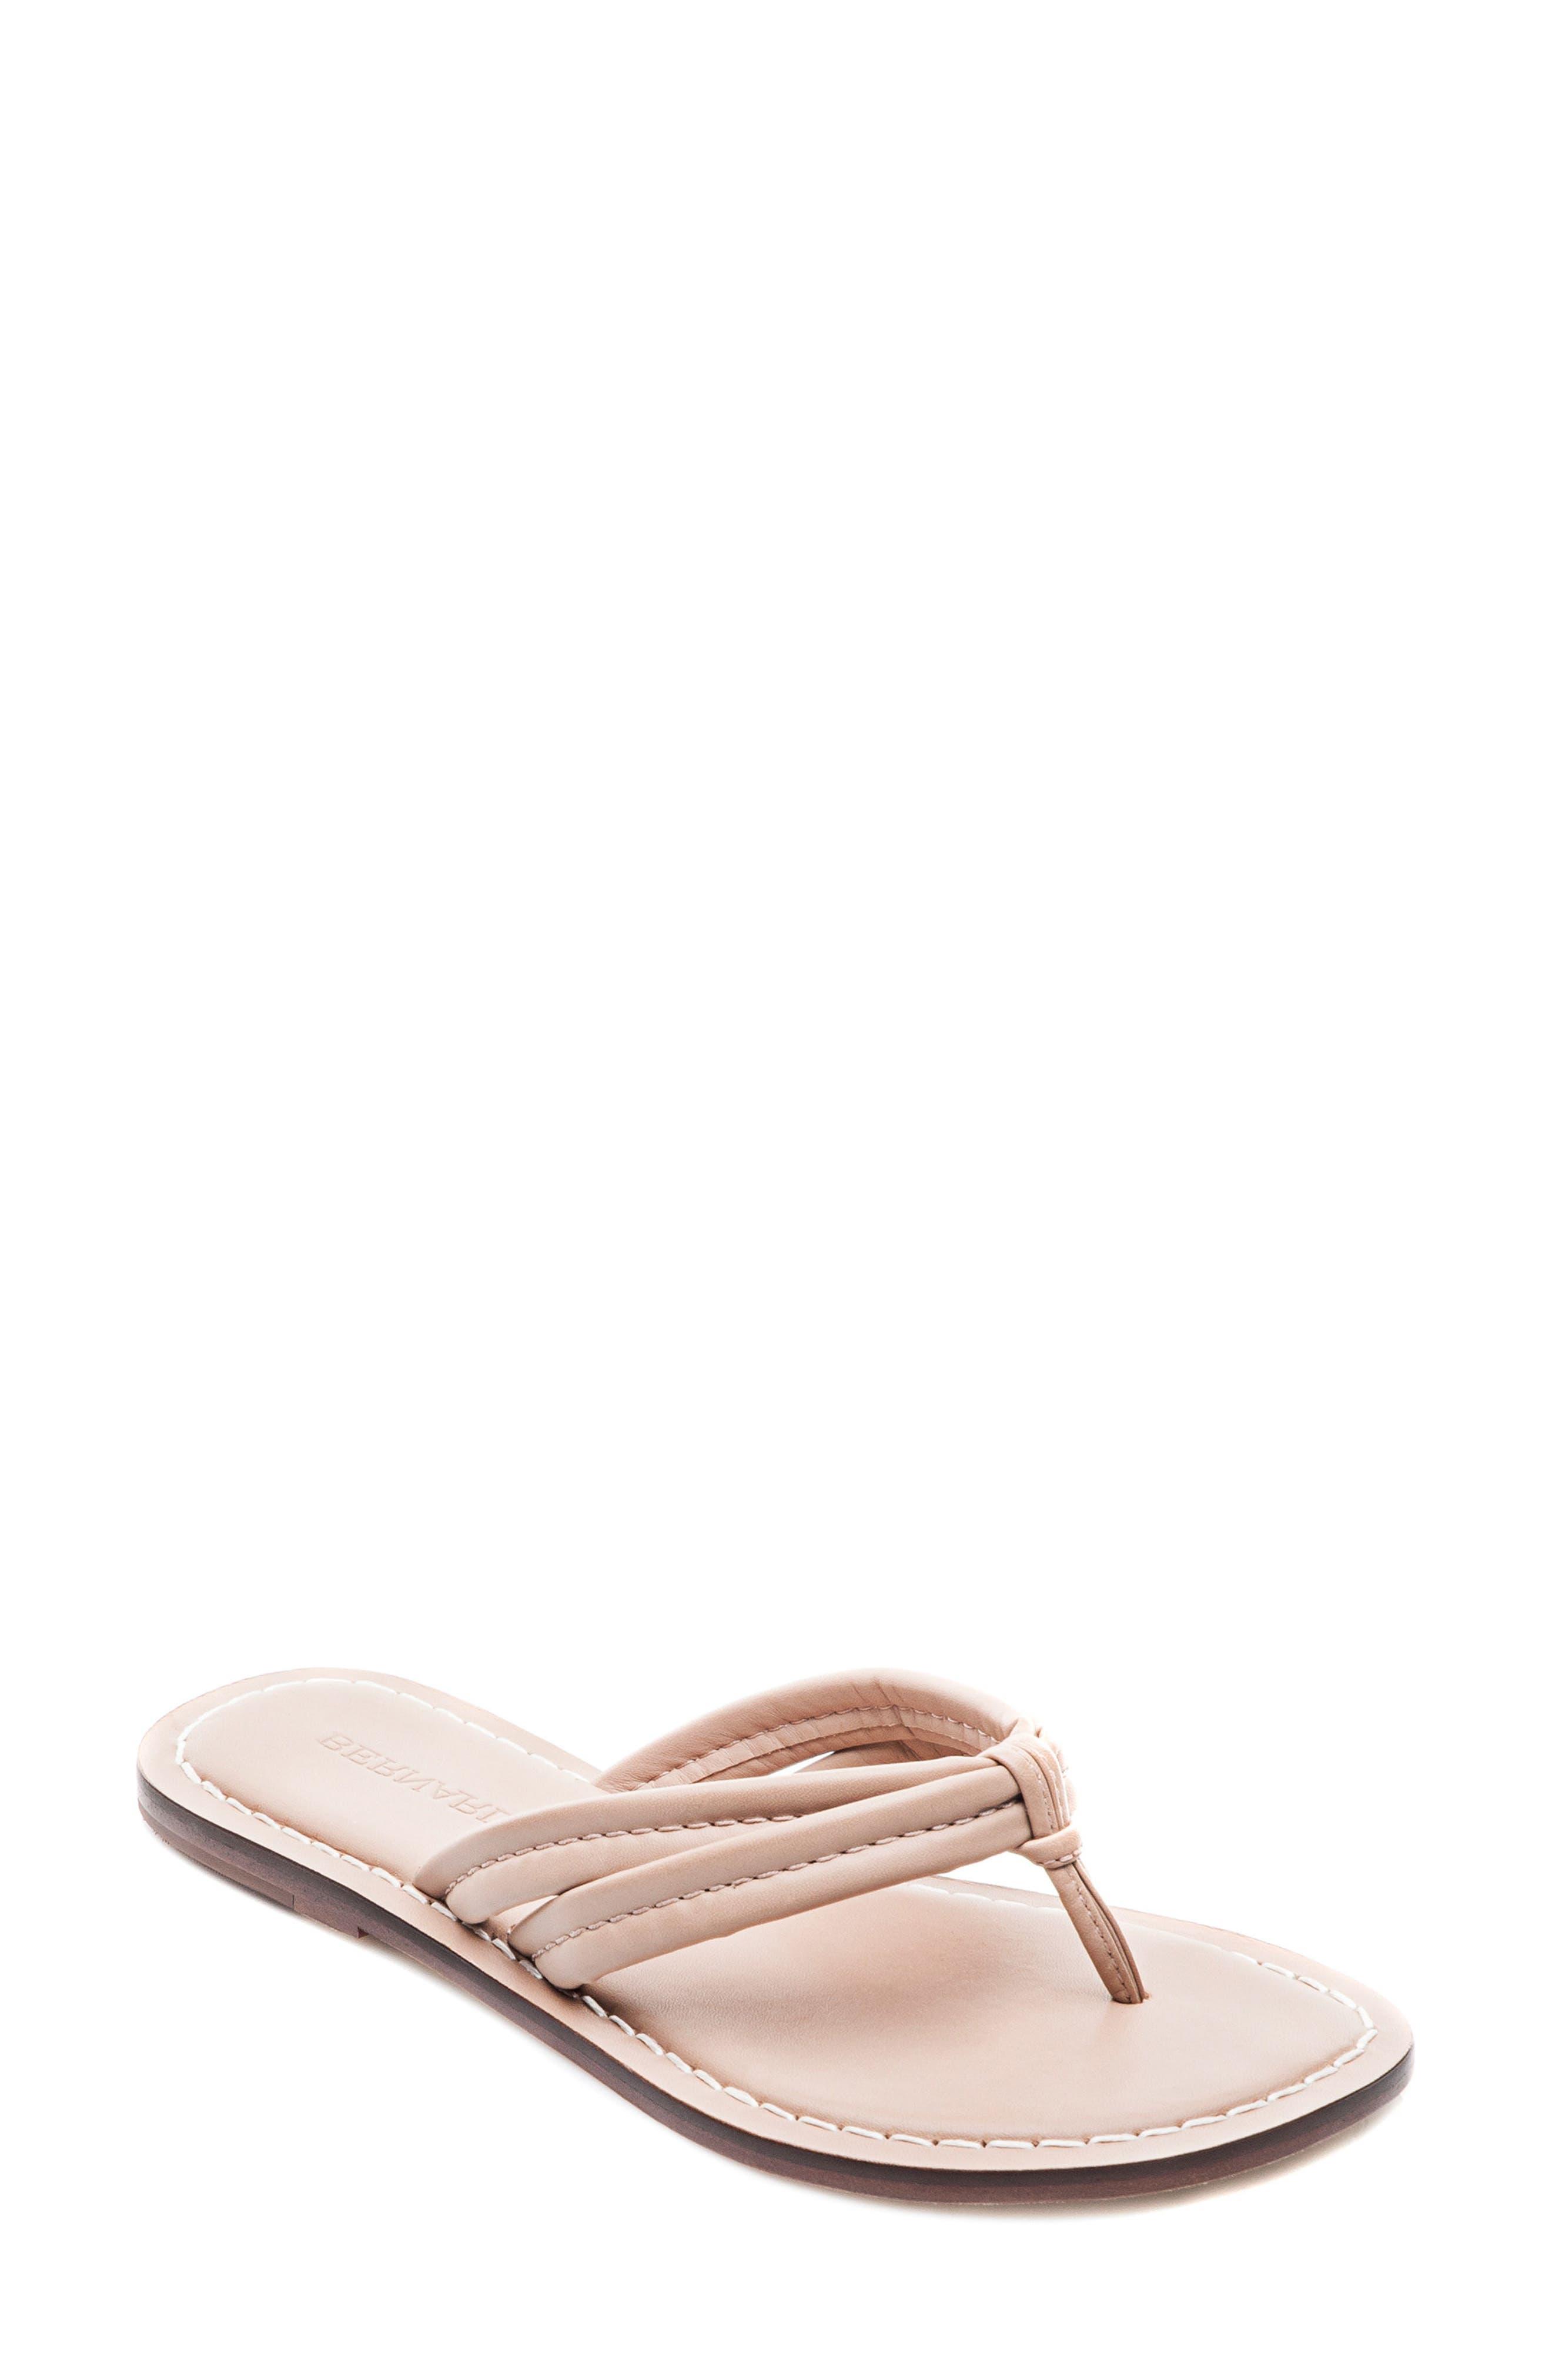 Bernardo Miami Sandal,                         Main,                         color, Blush Leather